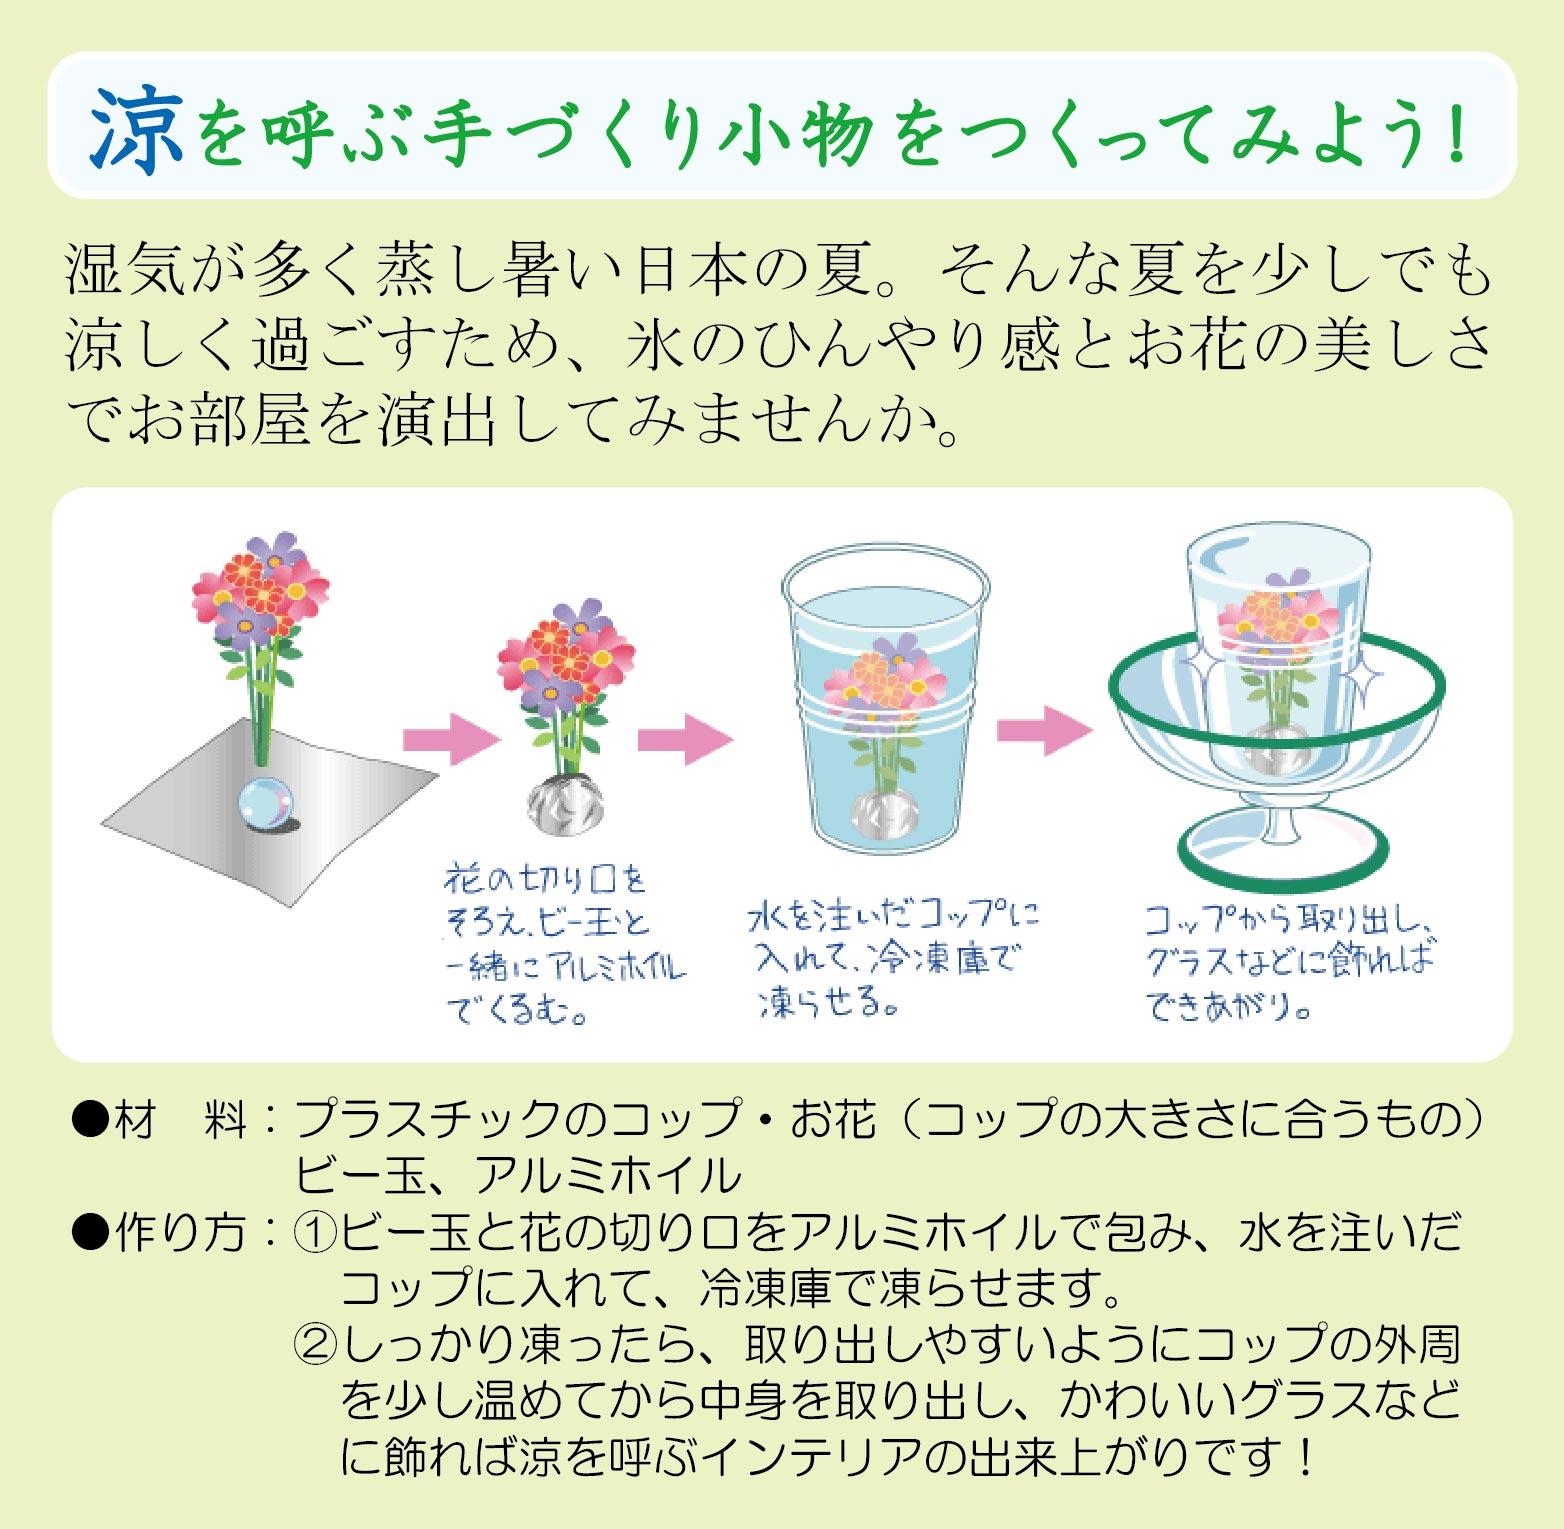 KuraSi-natu-sin86-13.jpg